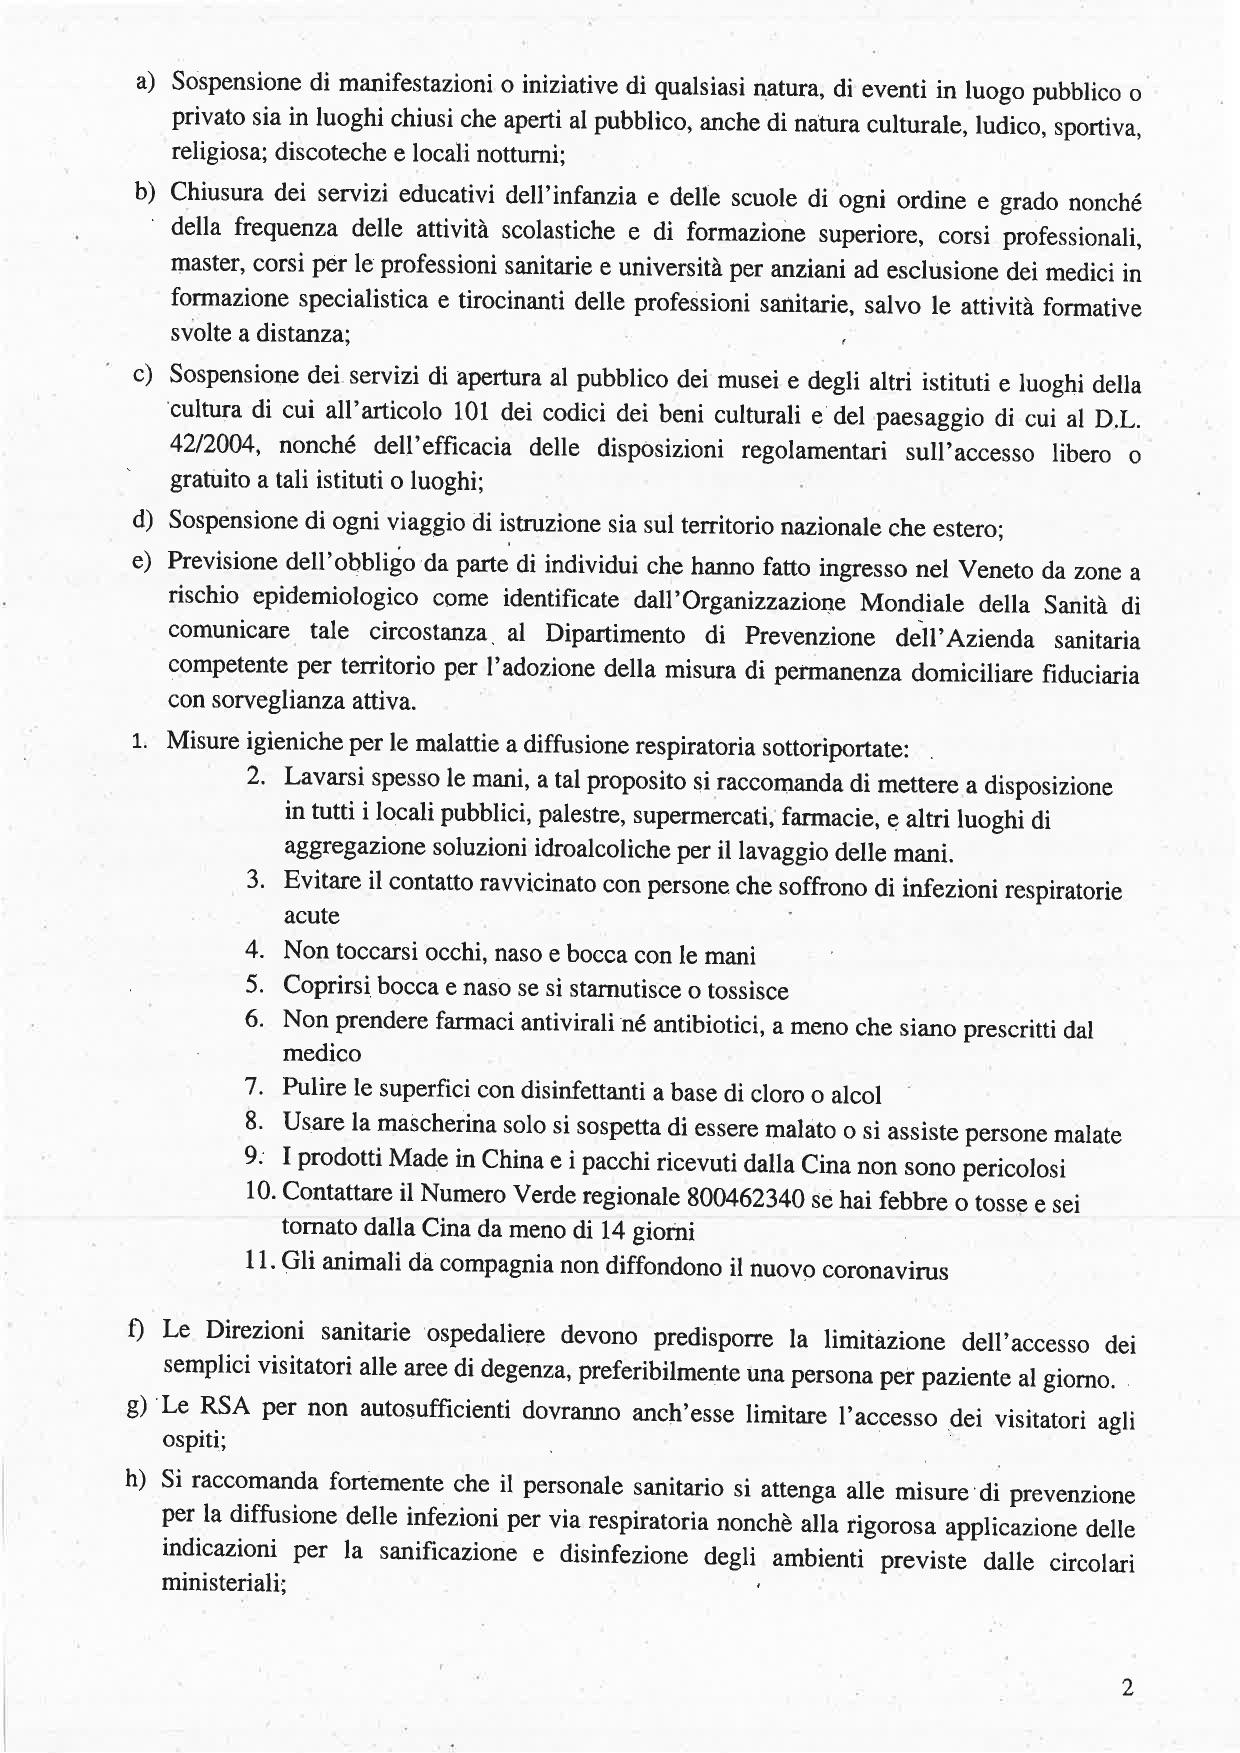 Ordinanza n. 1 23.02.2020 - 2